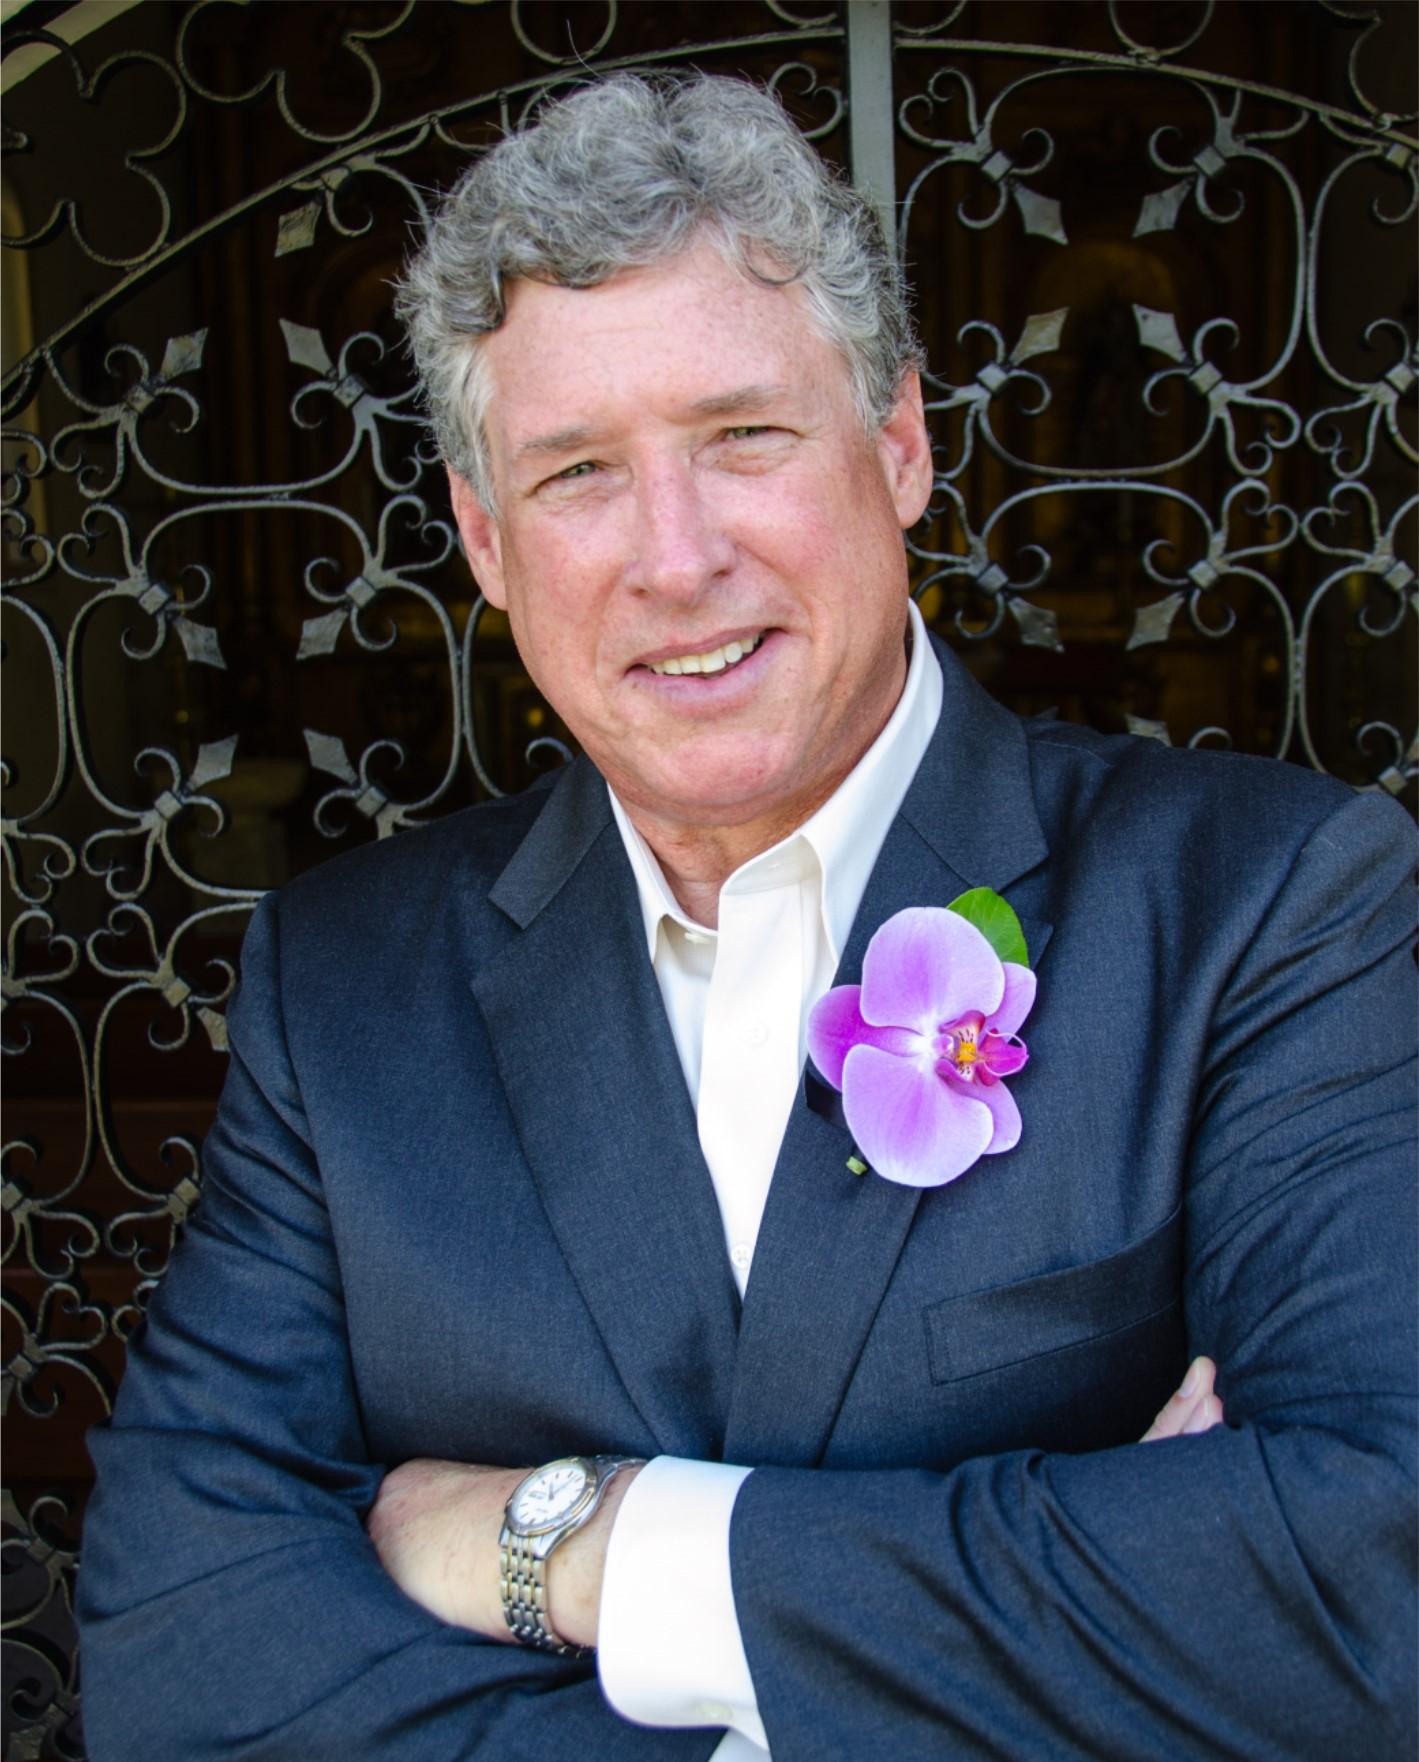 John Souerbry Broker Owner REALTOR Cordon Real Estate